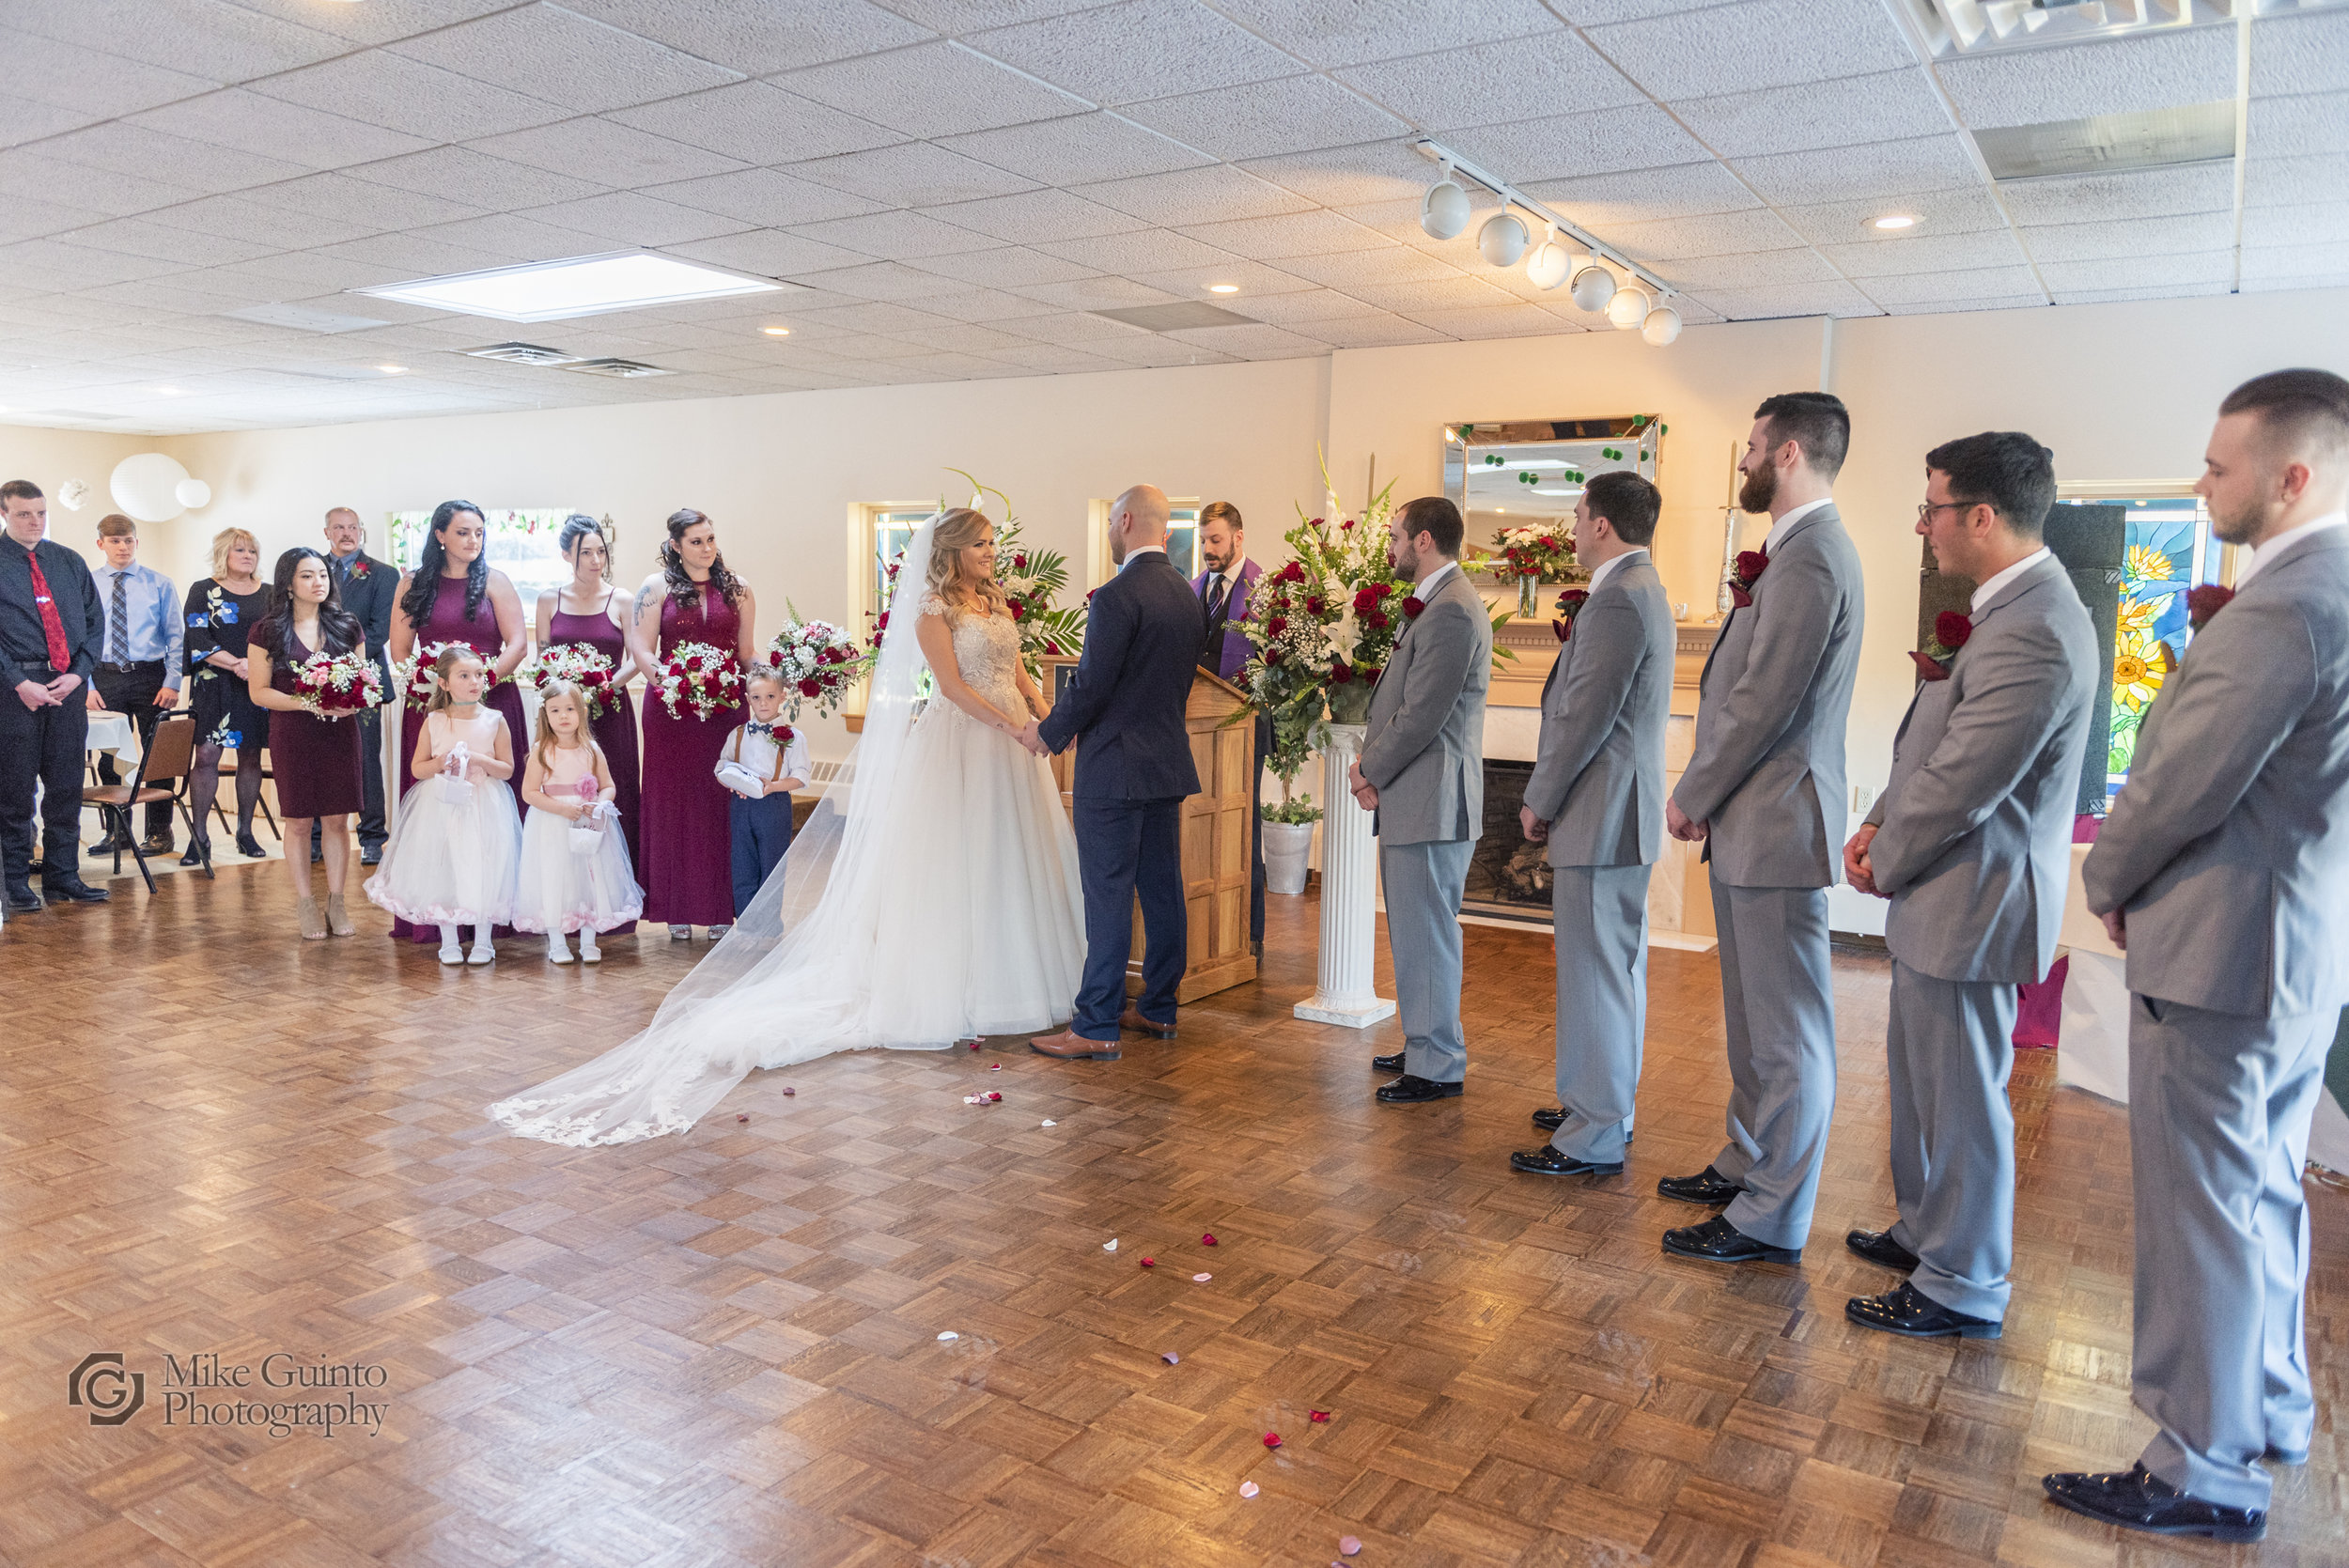 20190223_Wedding_Jaworski_270.jpg